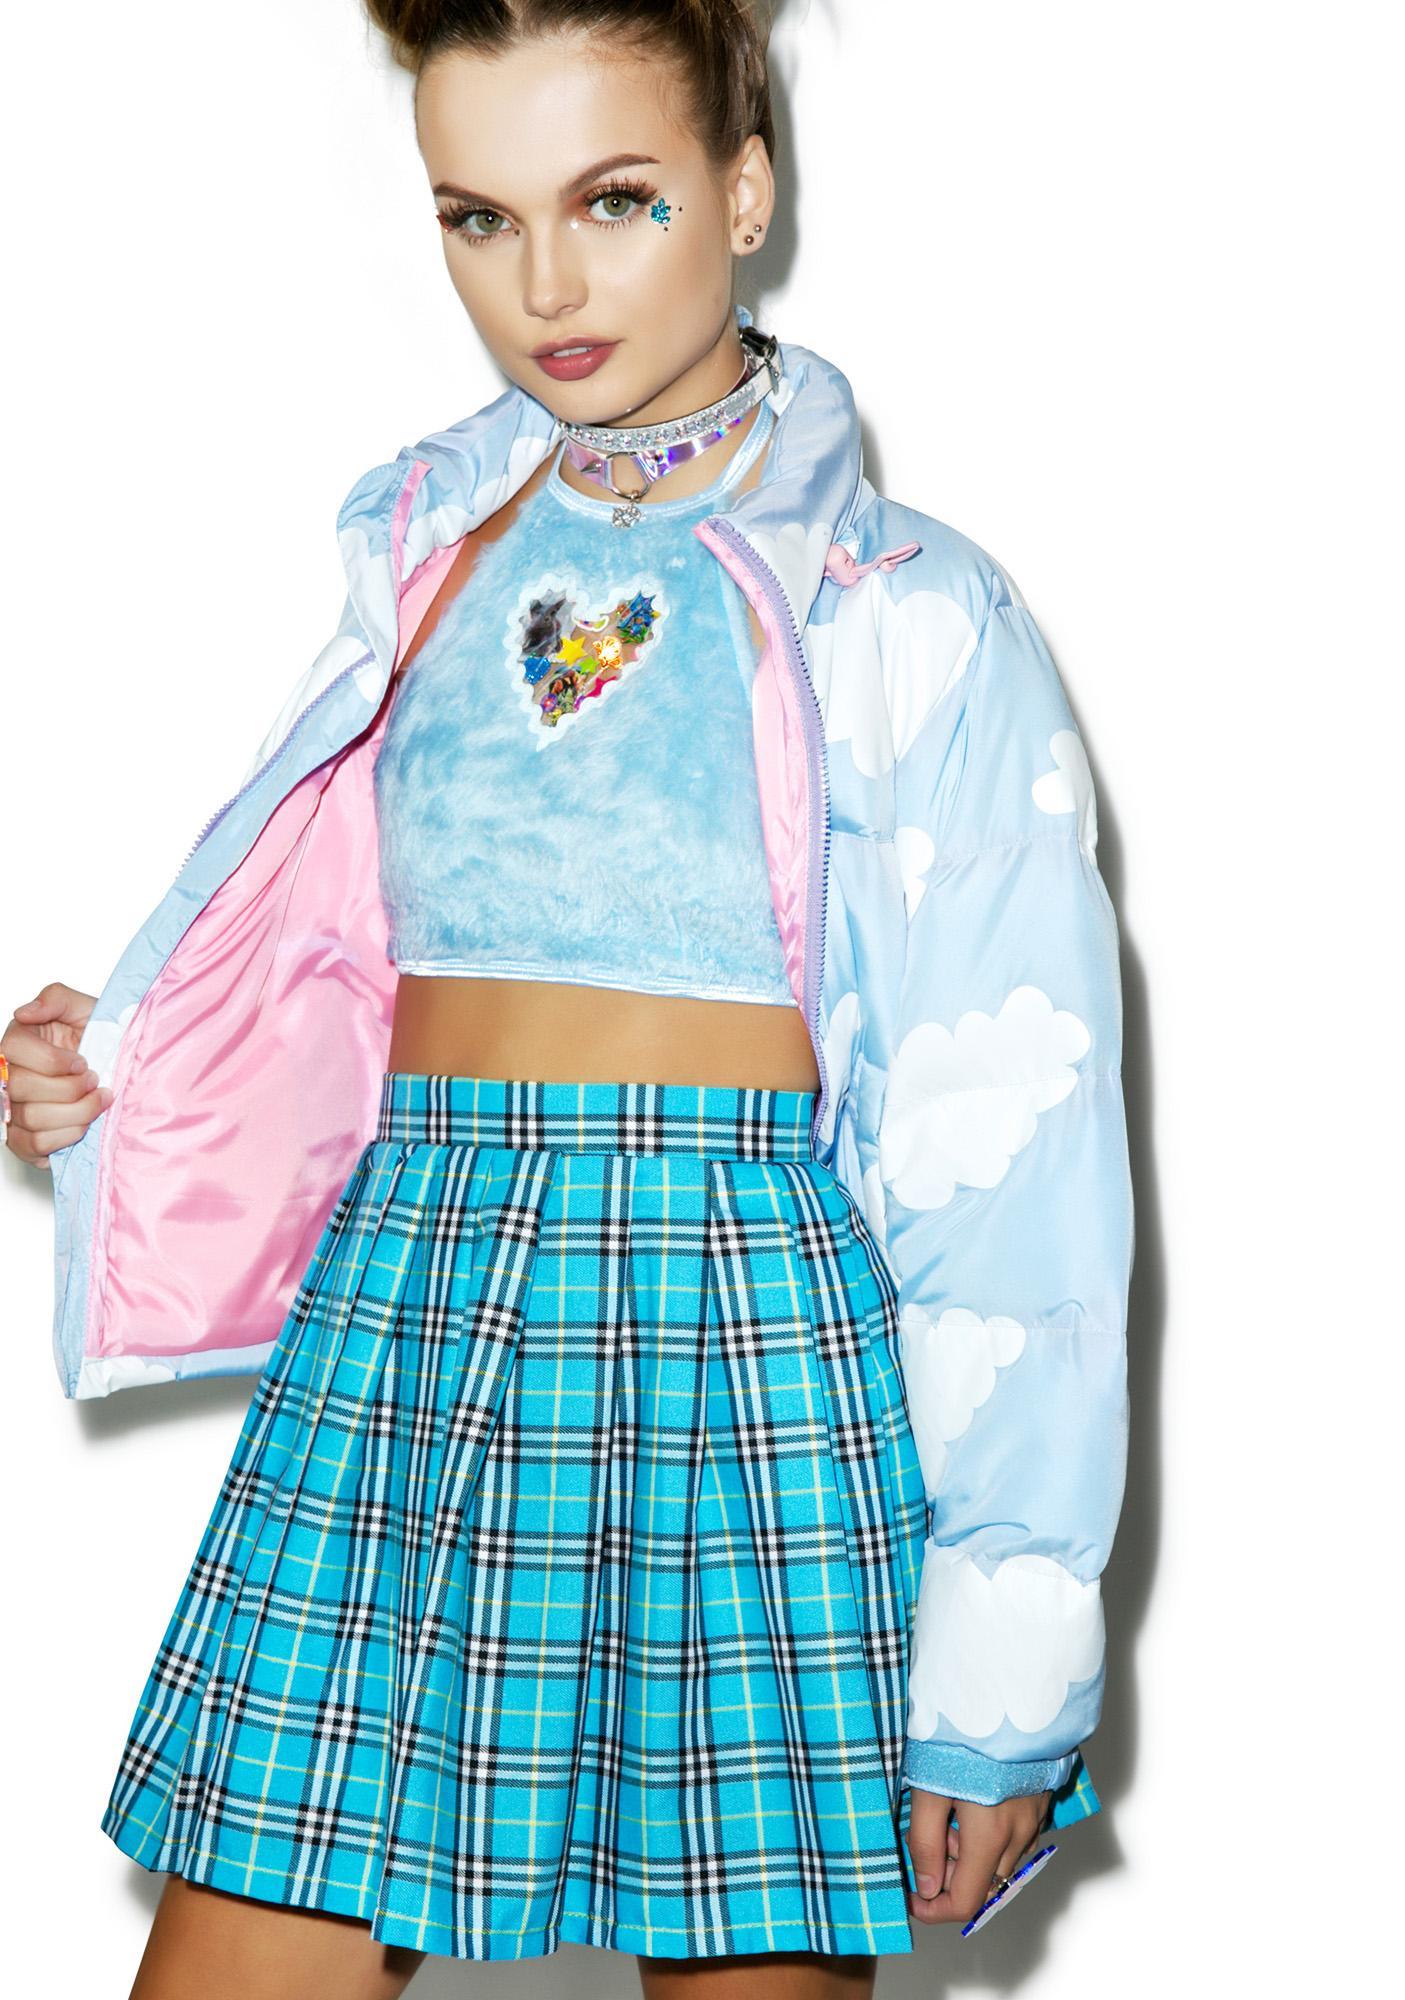 Reality Bites Blues Plaid Skirt